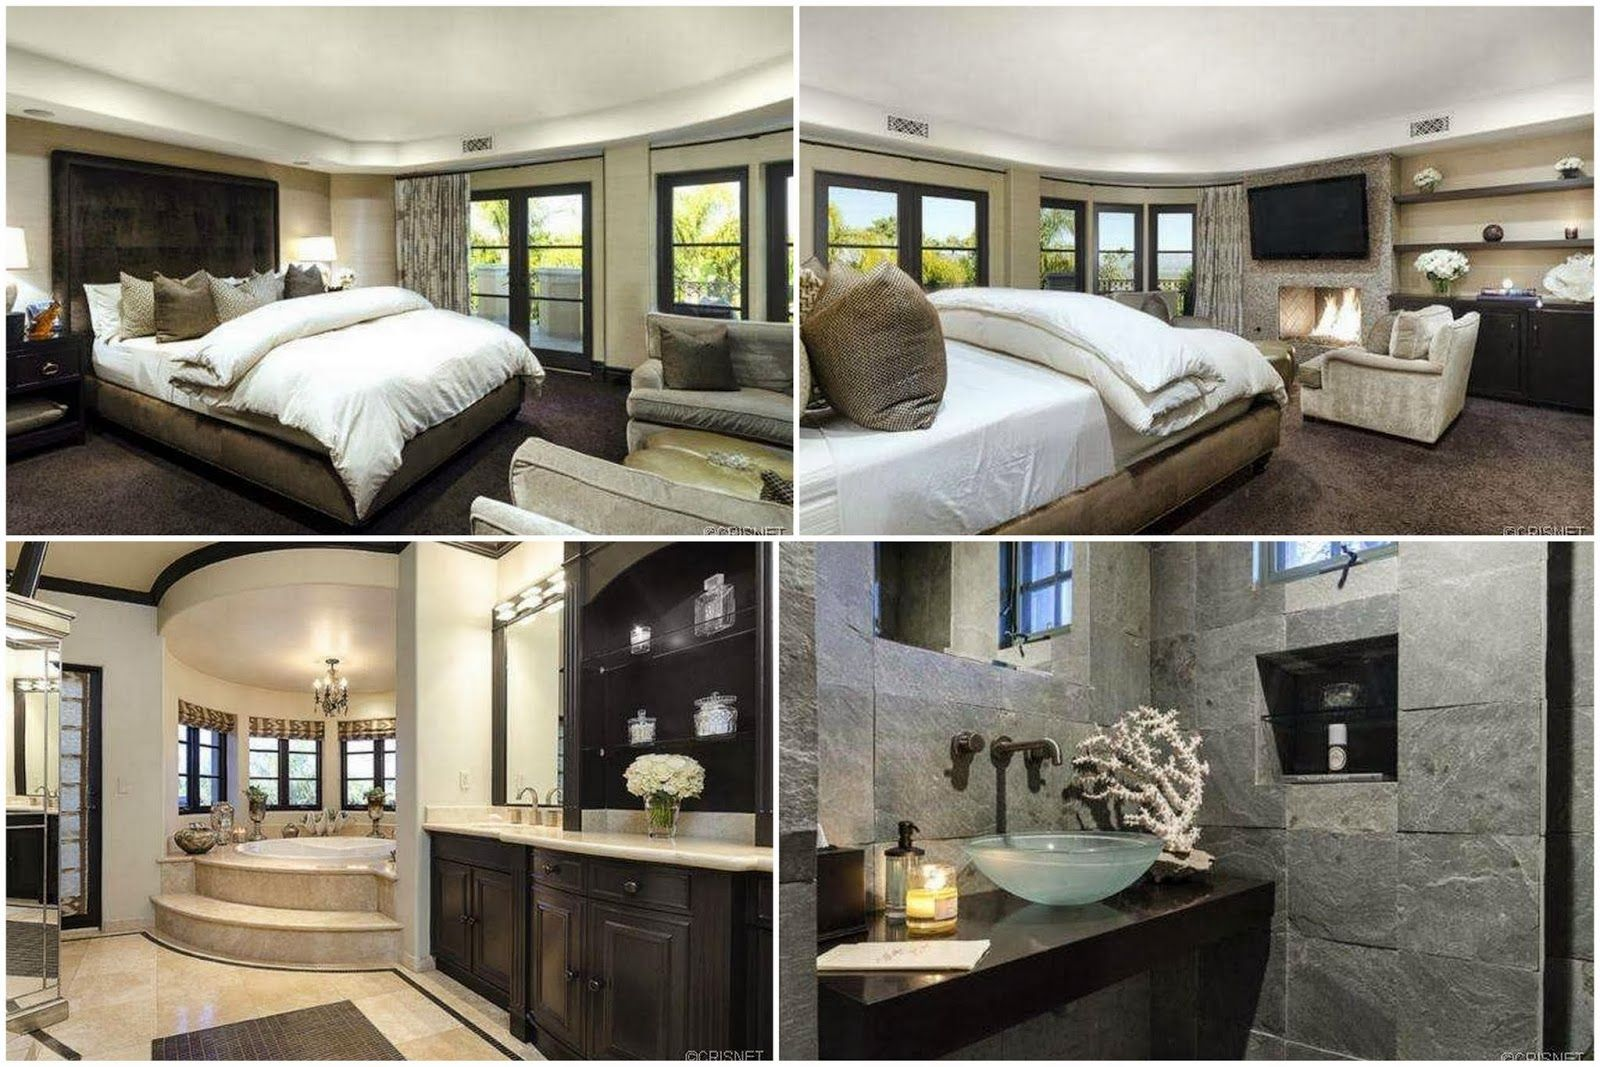 Khloe kardashian new house interior google search